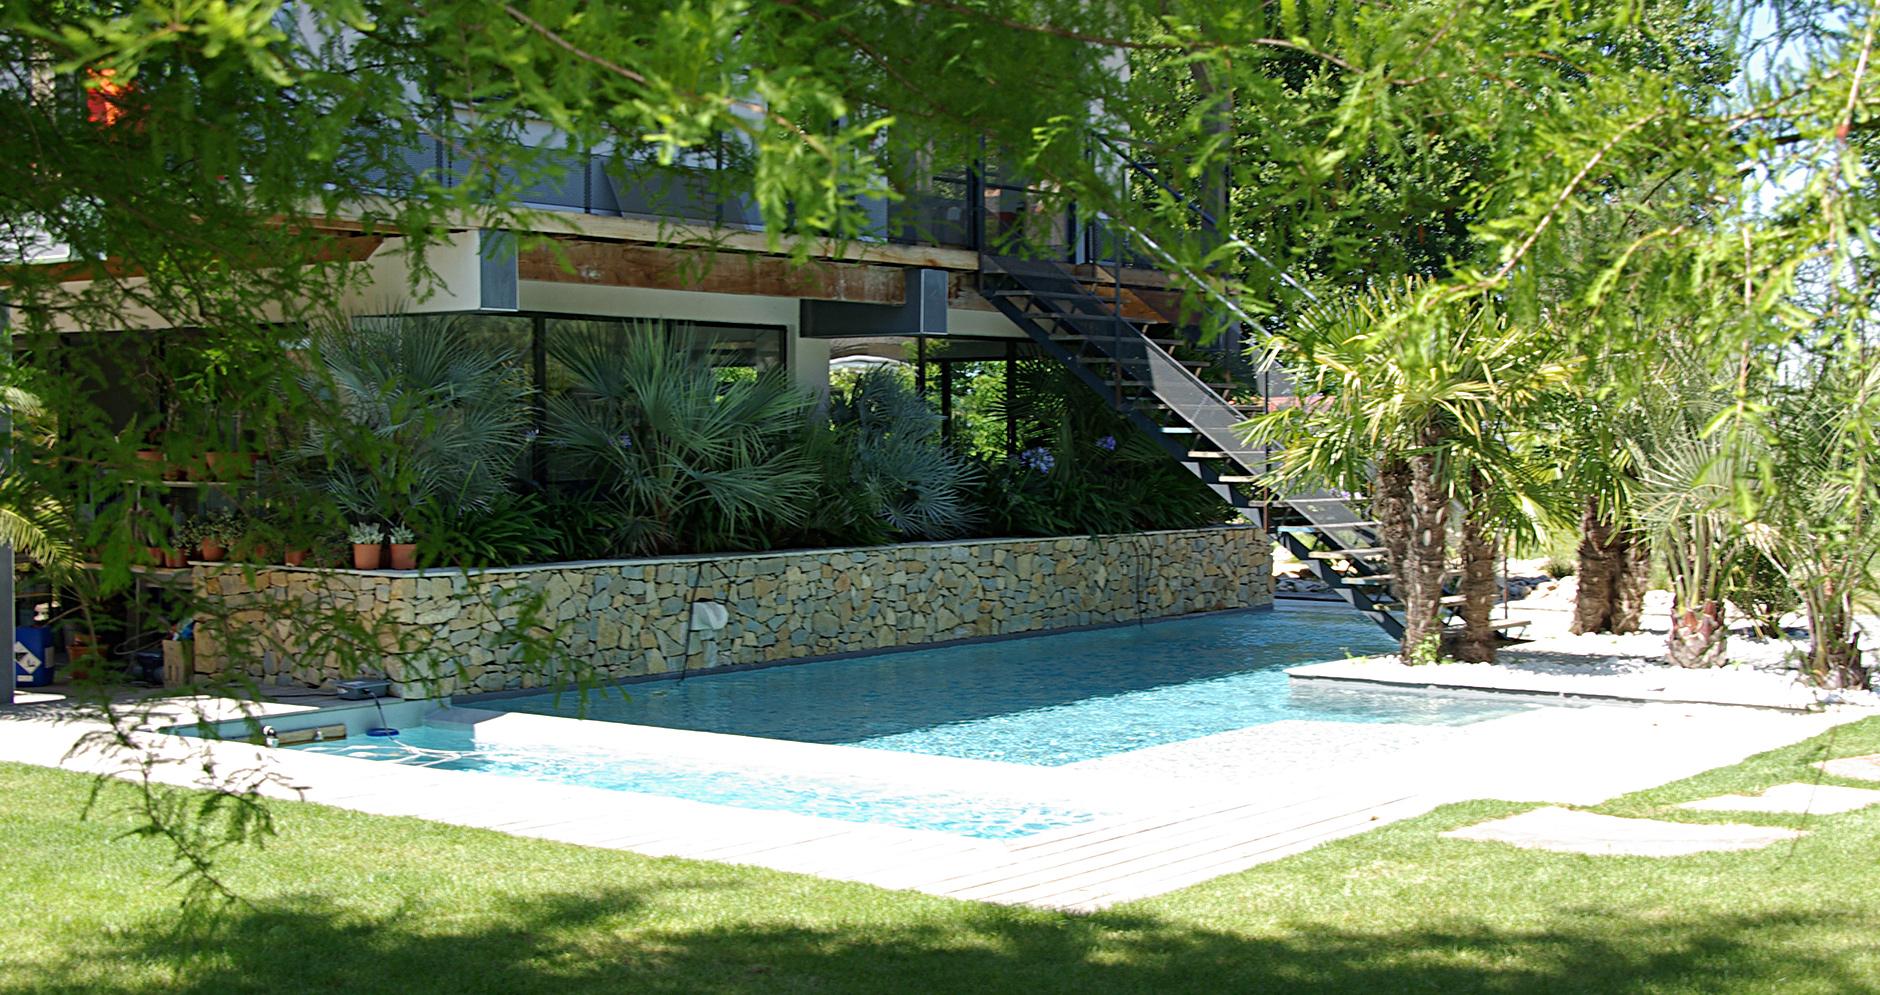 Concept jardin cr ateur de piscines concept jardin for Jardin concept